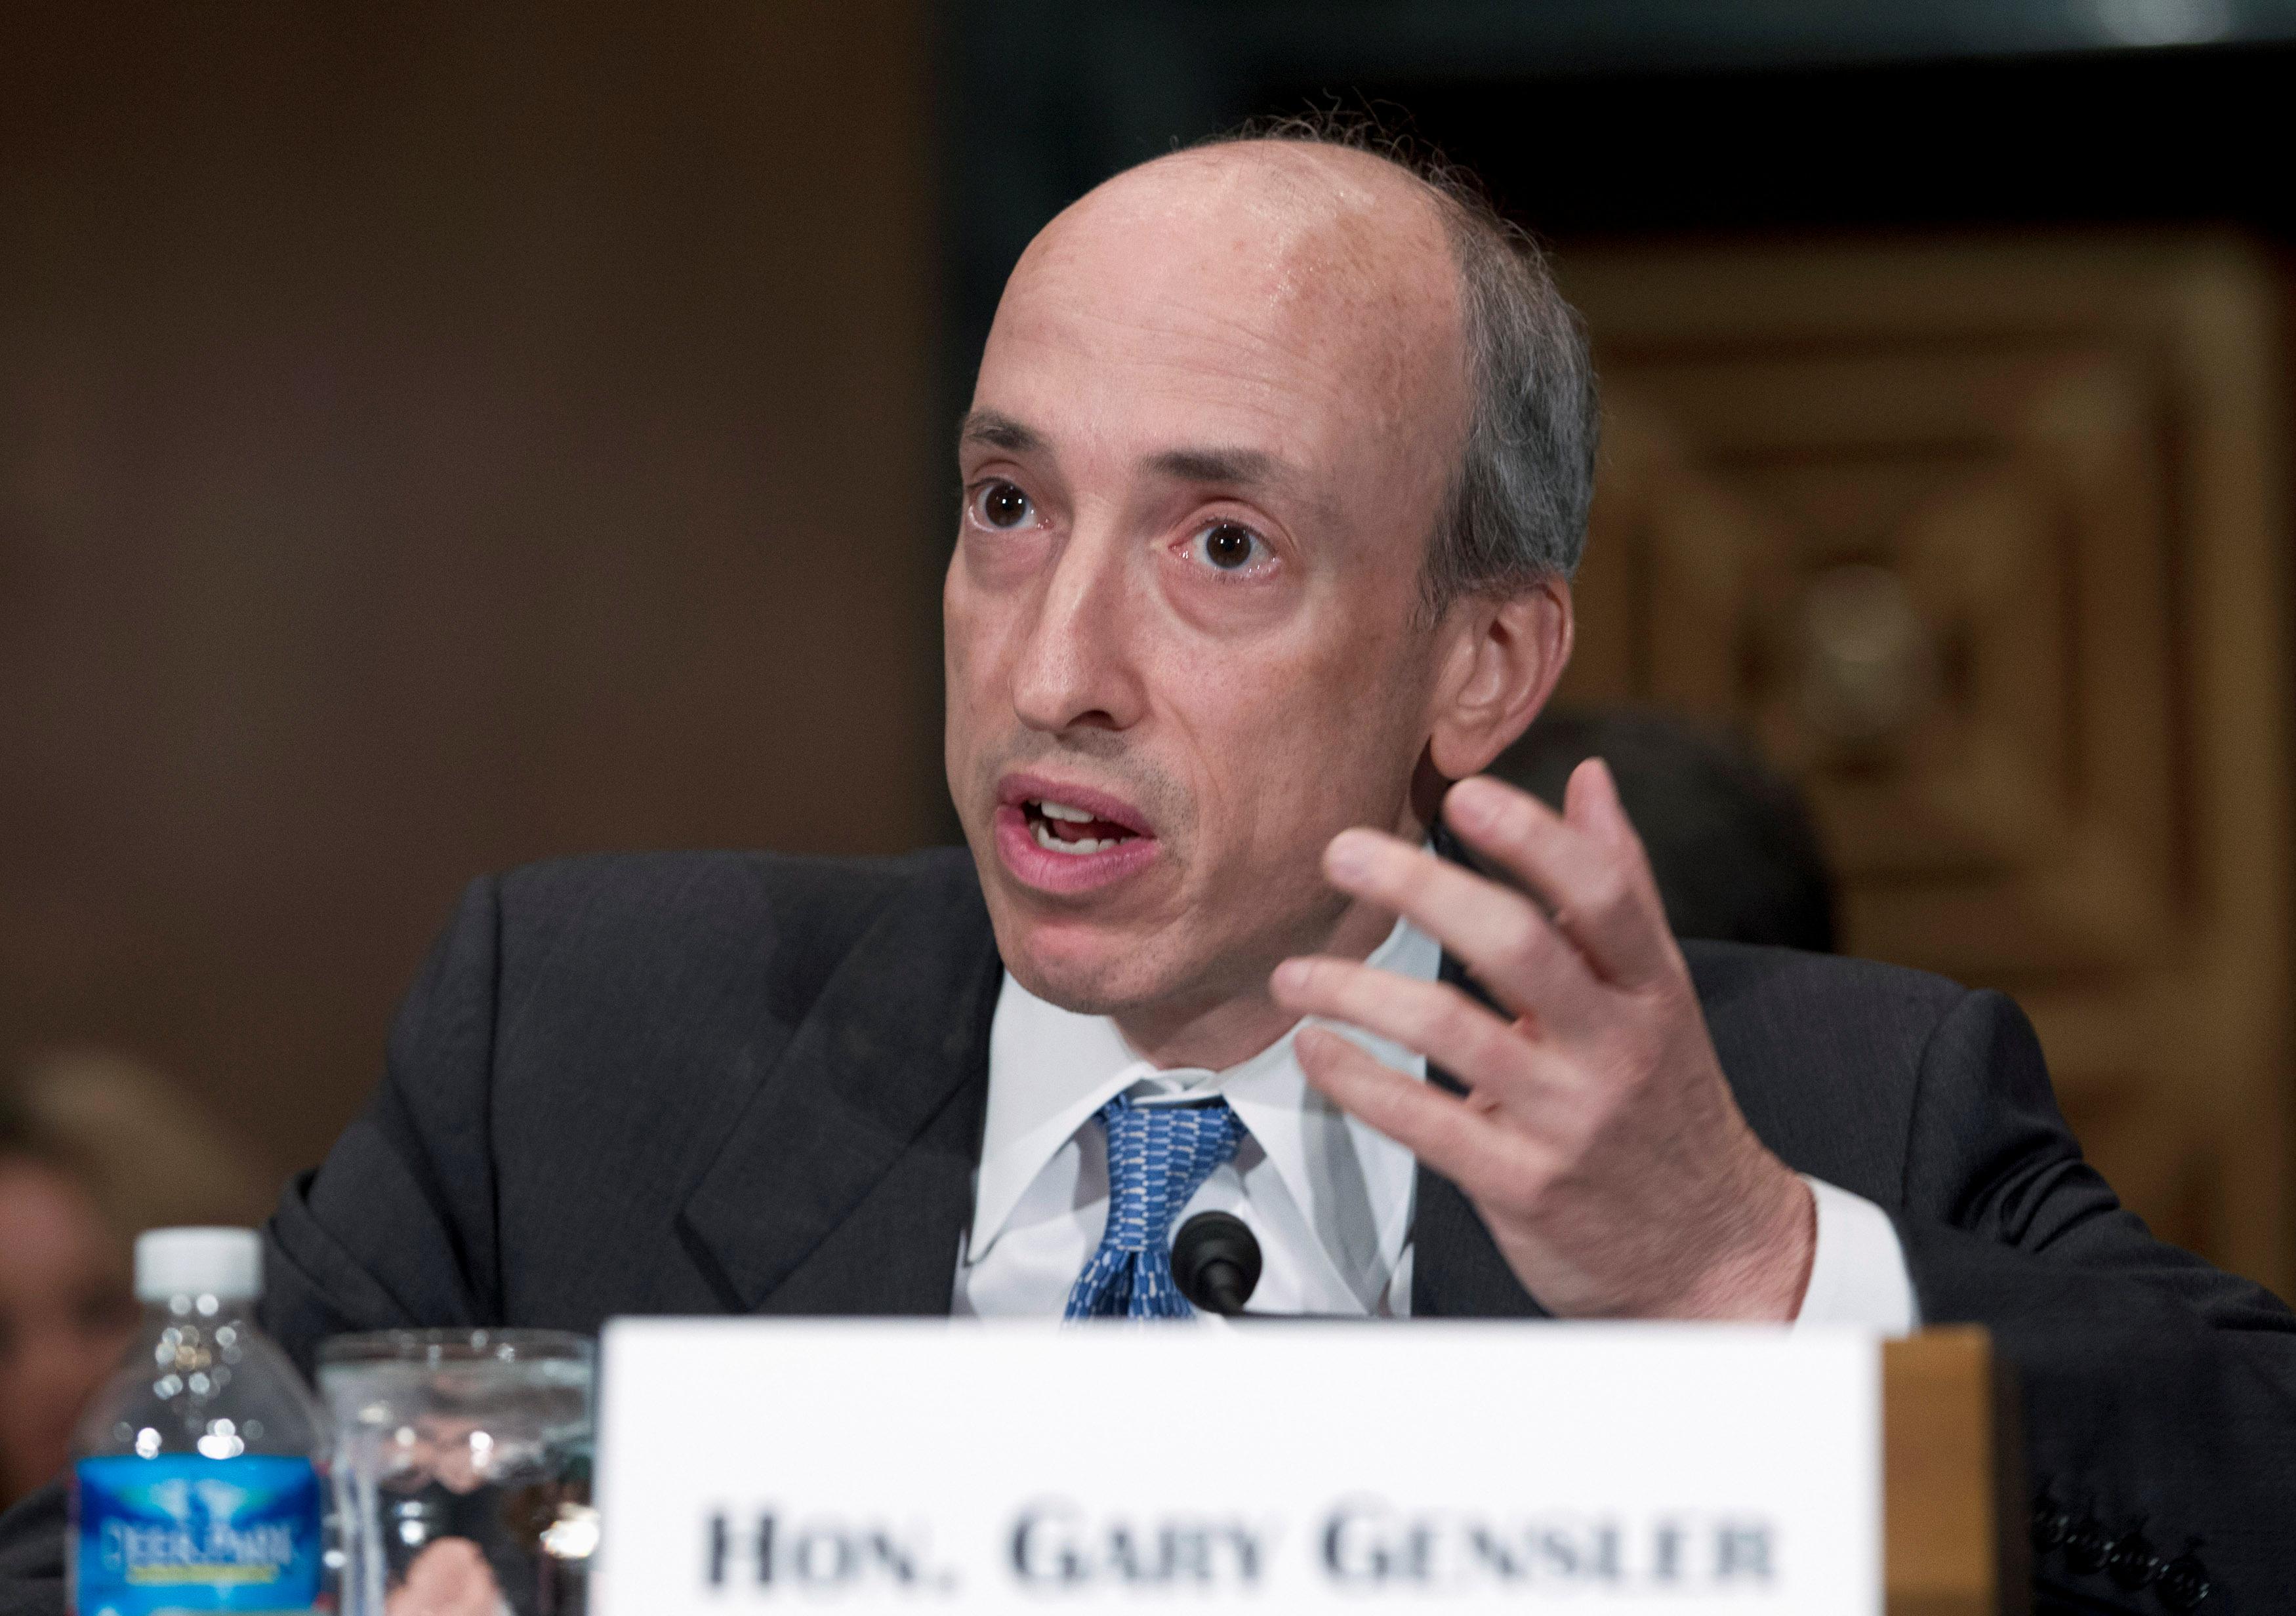 Gary Gensler testifies at a Senate Banking, Housing and Urban Affairs Committee hearing on Capitol Hill July 30, 2013. REUTERS/Jose Luis Magana